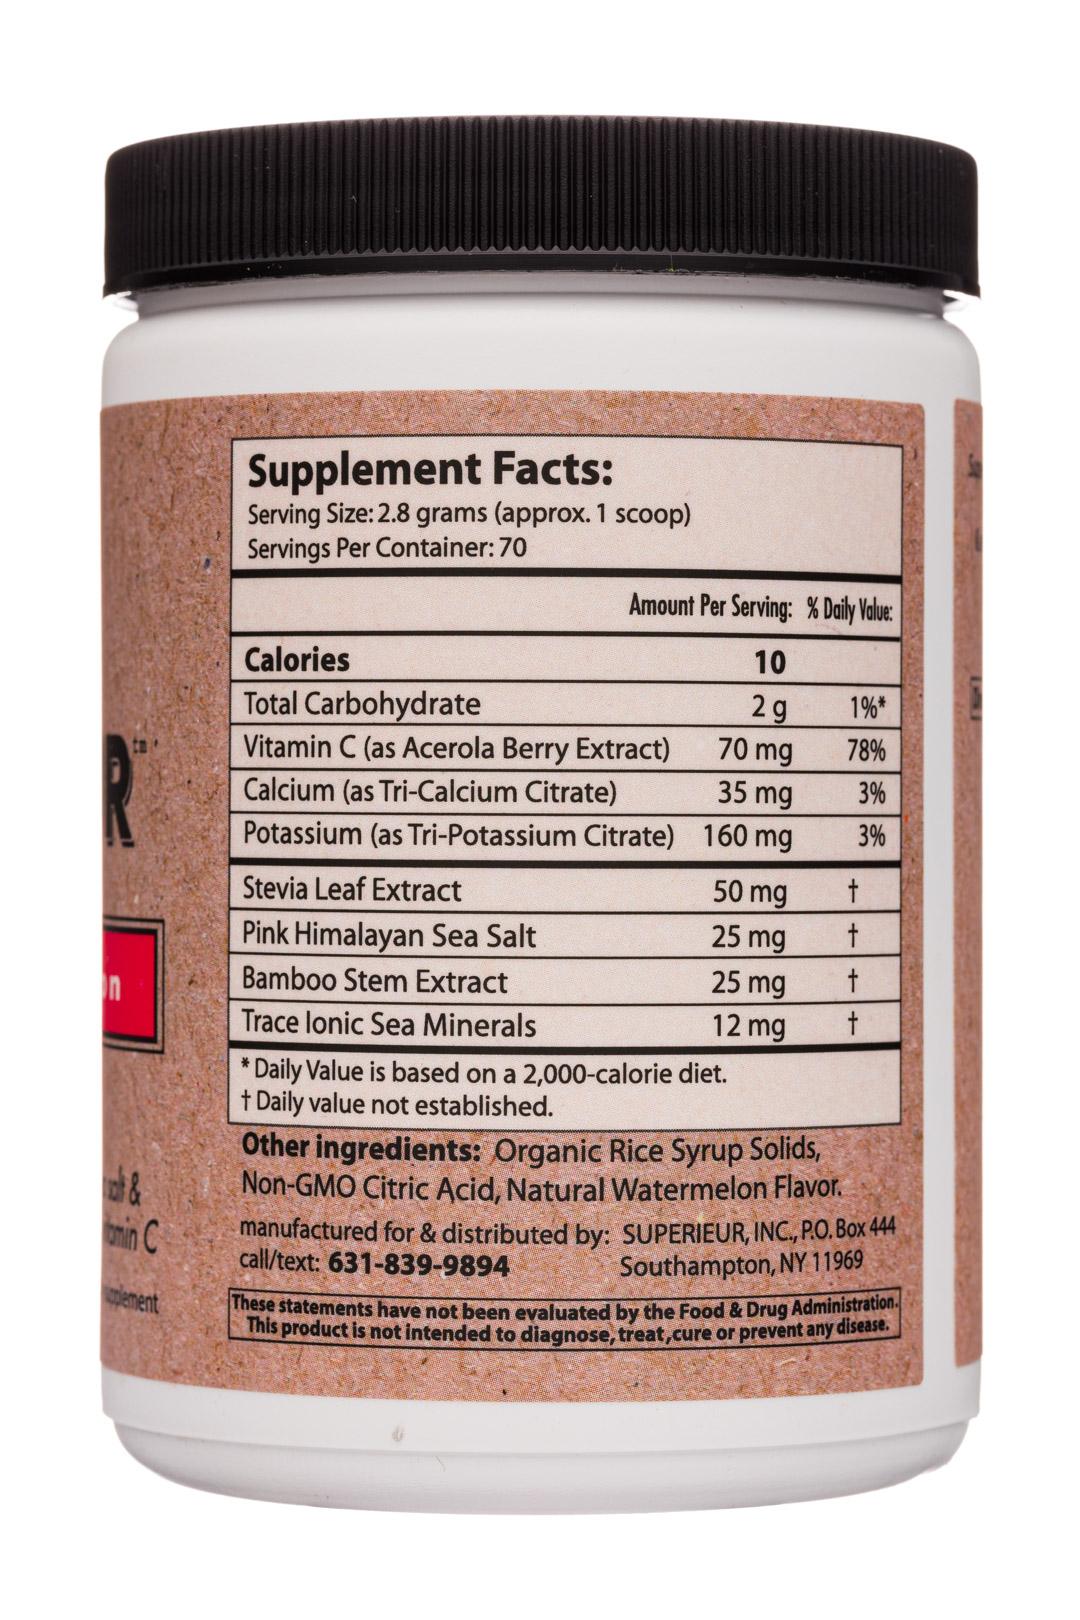 Superieur [Electrolytes]: Superieur-7oz-Electrolytes-FreshWatermelon-Facts